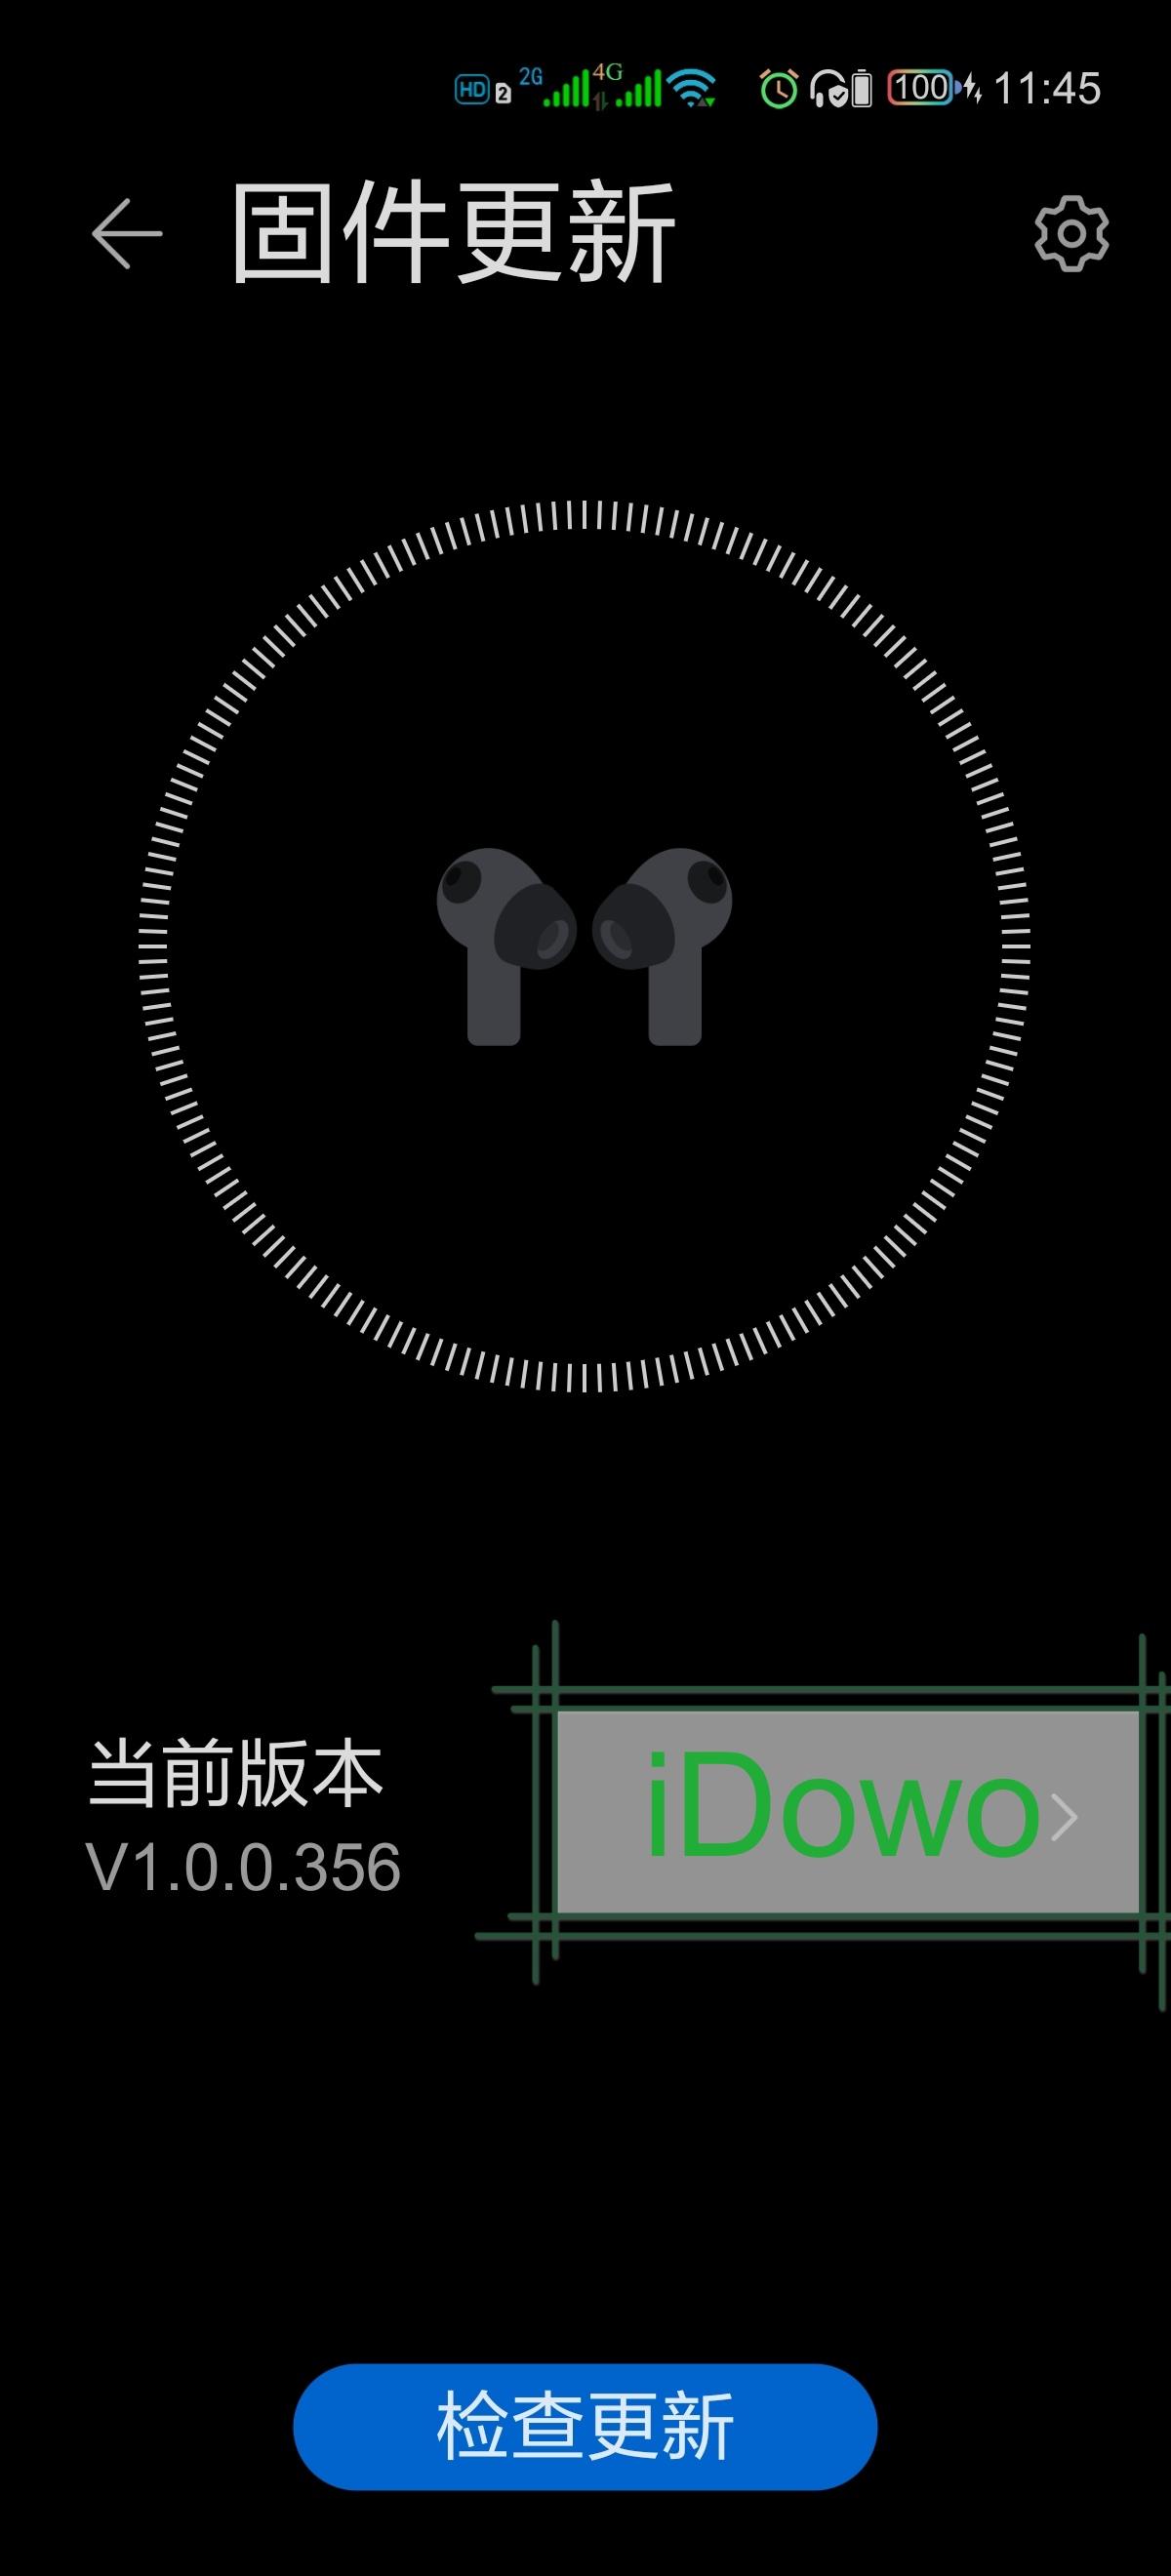 Screenshot_20210329_114532_com.huawei.smarthome_edit_380669865595558.jpg